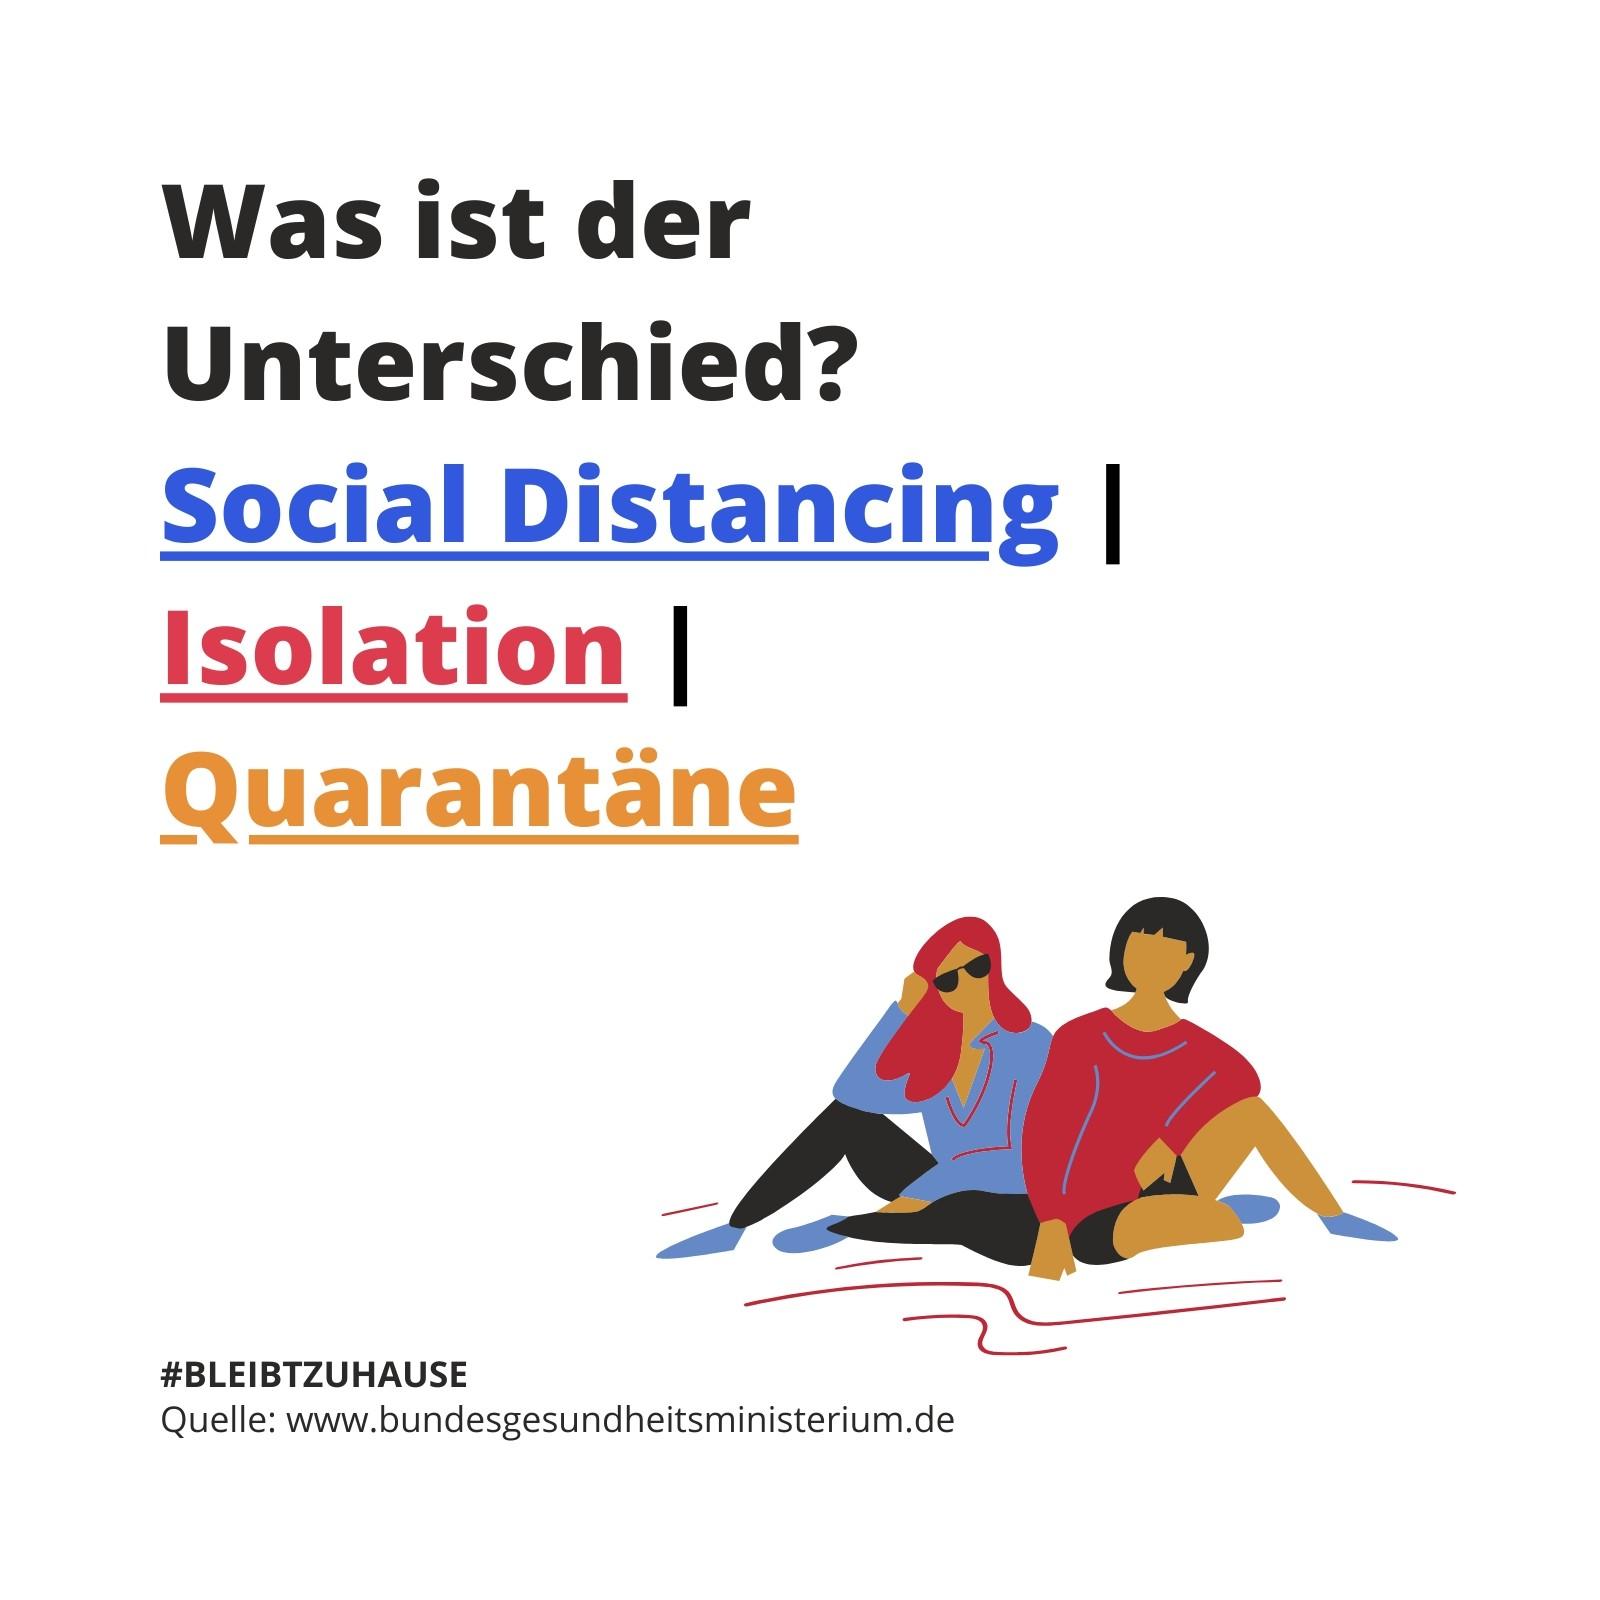 Social Distancing, Isolation und Quarantäne Corona Virus Aufmerksamkeit Instagram Post